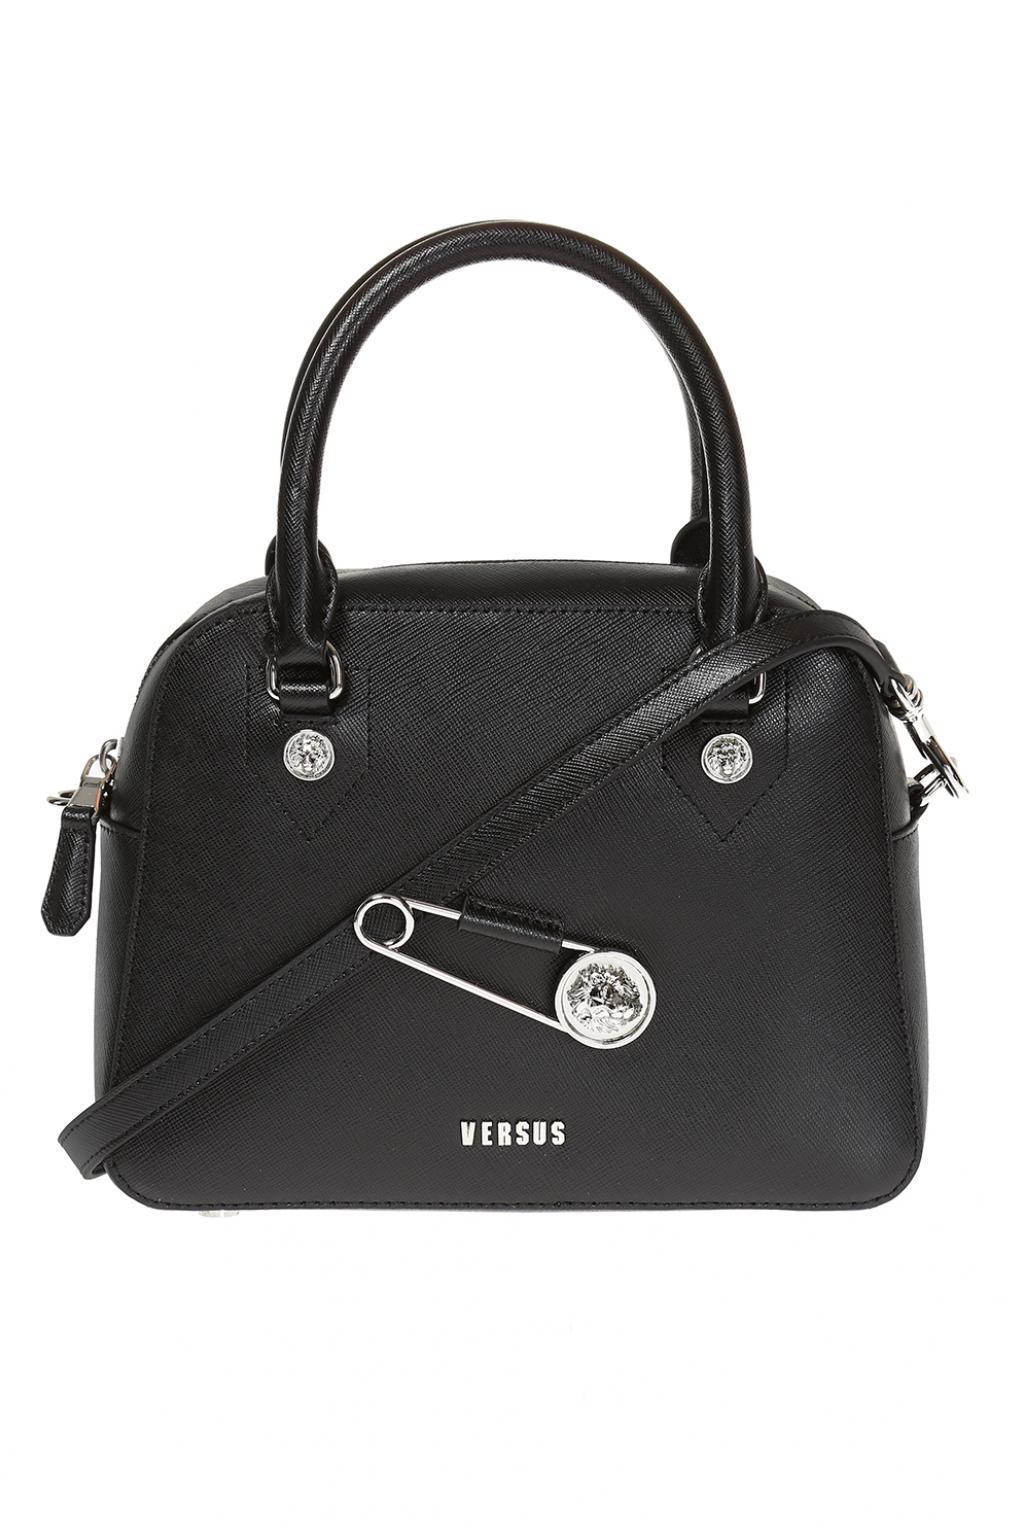 38da683490cc Lyst - Versace Safety-pin Shoulder Bag in Black